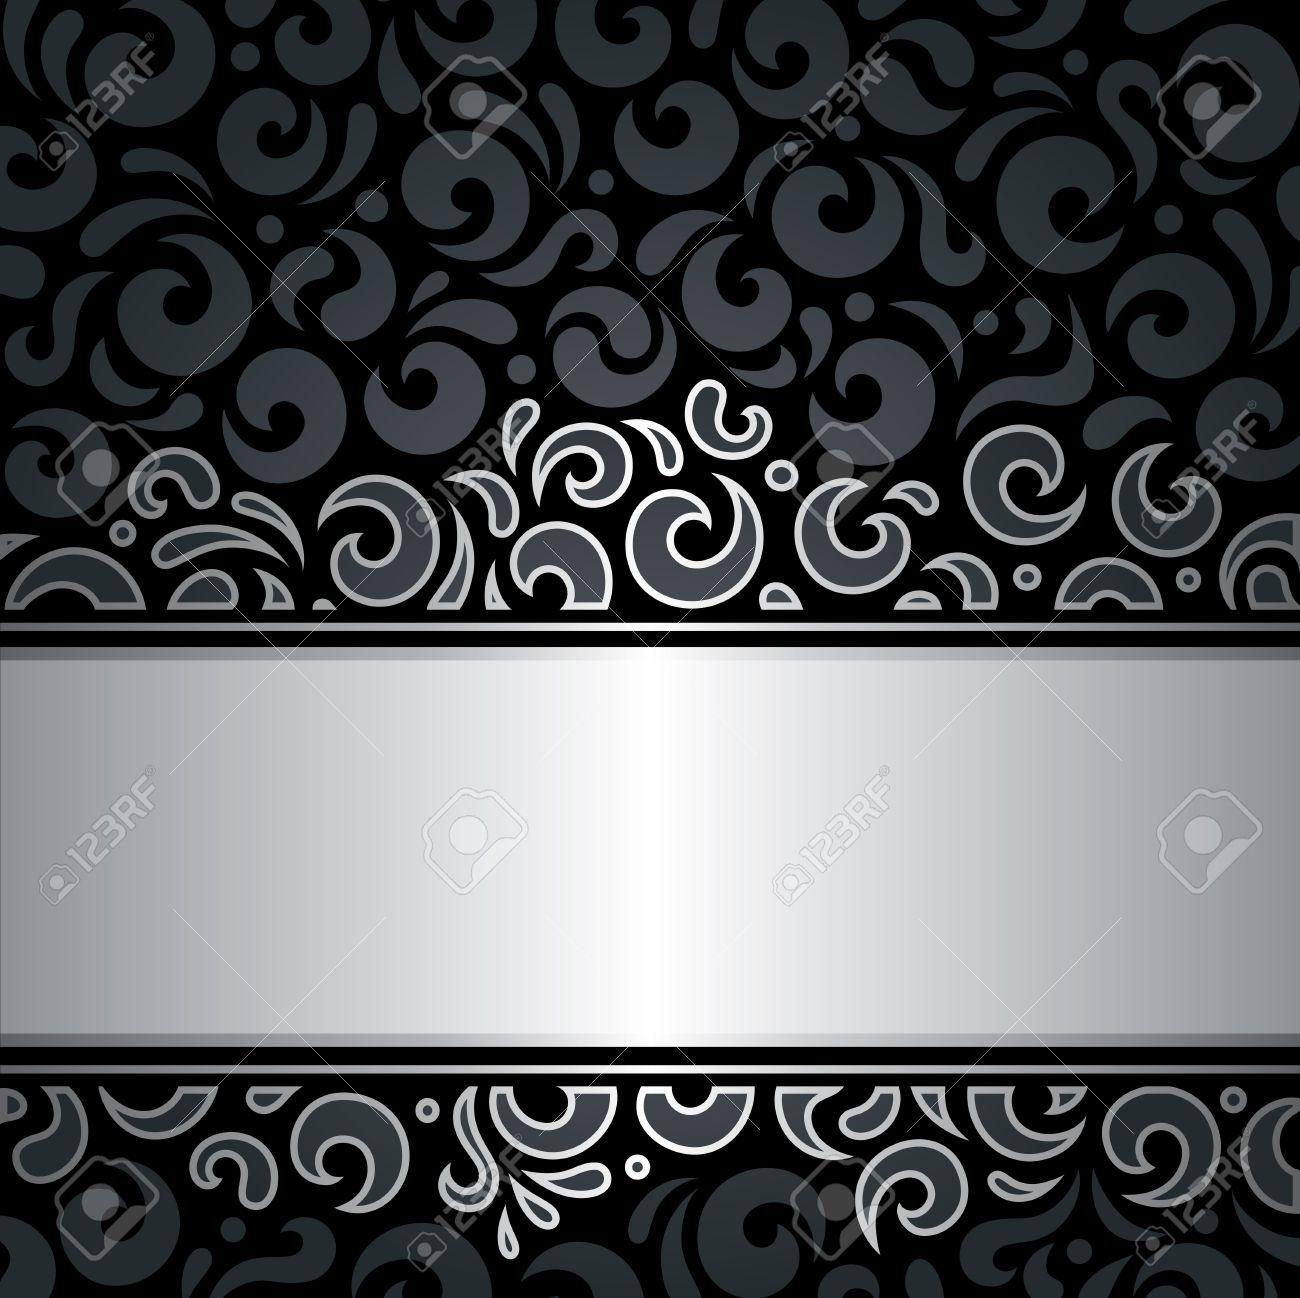 decorativo de lujo de plata negro de fiesta del vintage papel tapiz de fondo foto de